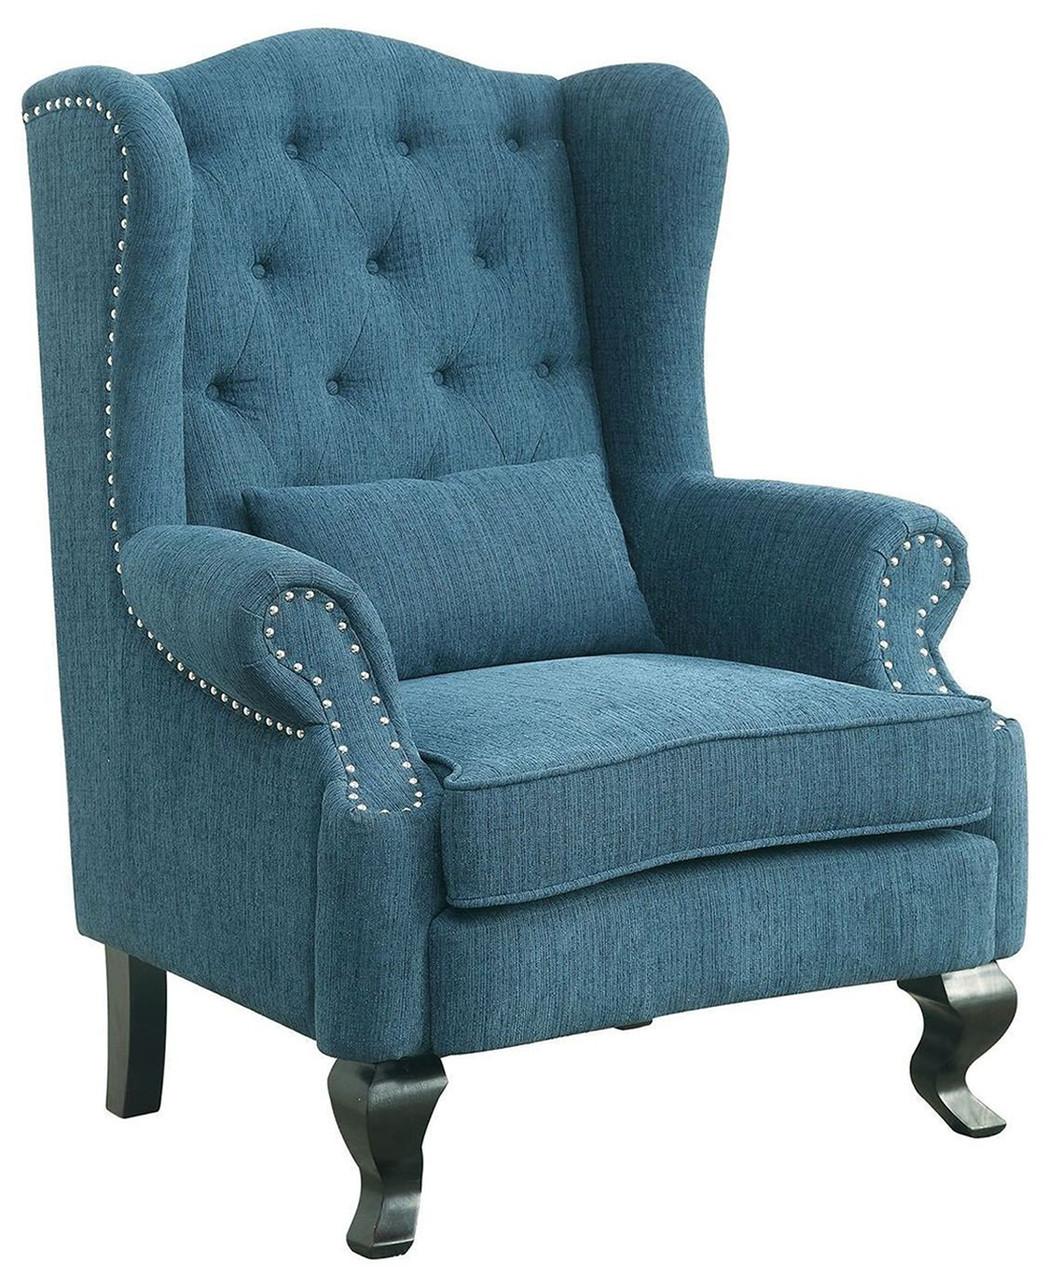 Super Kia Dark Teal Accent Chair Lamtechconsult Wood Chair Design Ideas Lamtechconsultcom